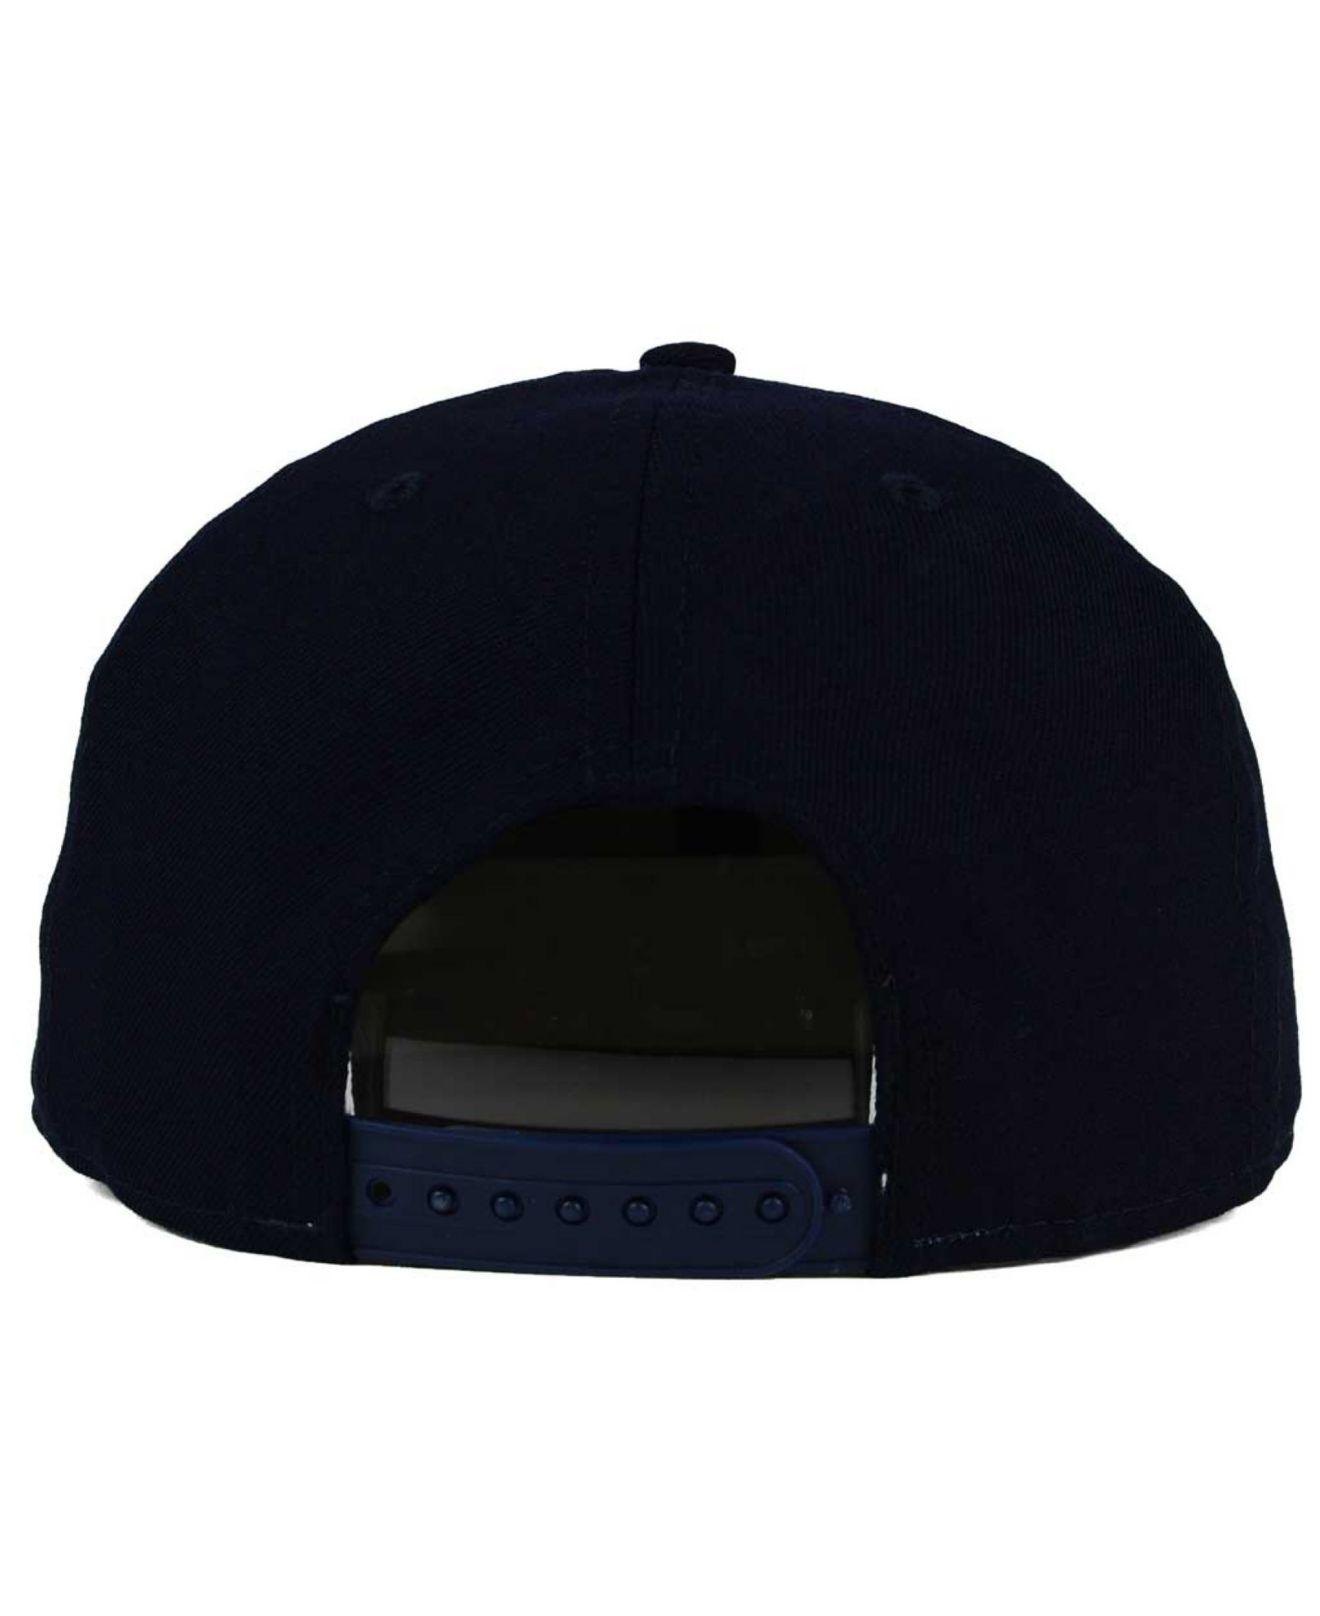 5ca3f615e23 ... low crown diamond era performance 59fifty fitted hat bc21f 58ec3   denmark lyst ktz detroit tigers xl script 9fifty snapback cap in blue for  men 54845 ...